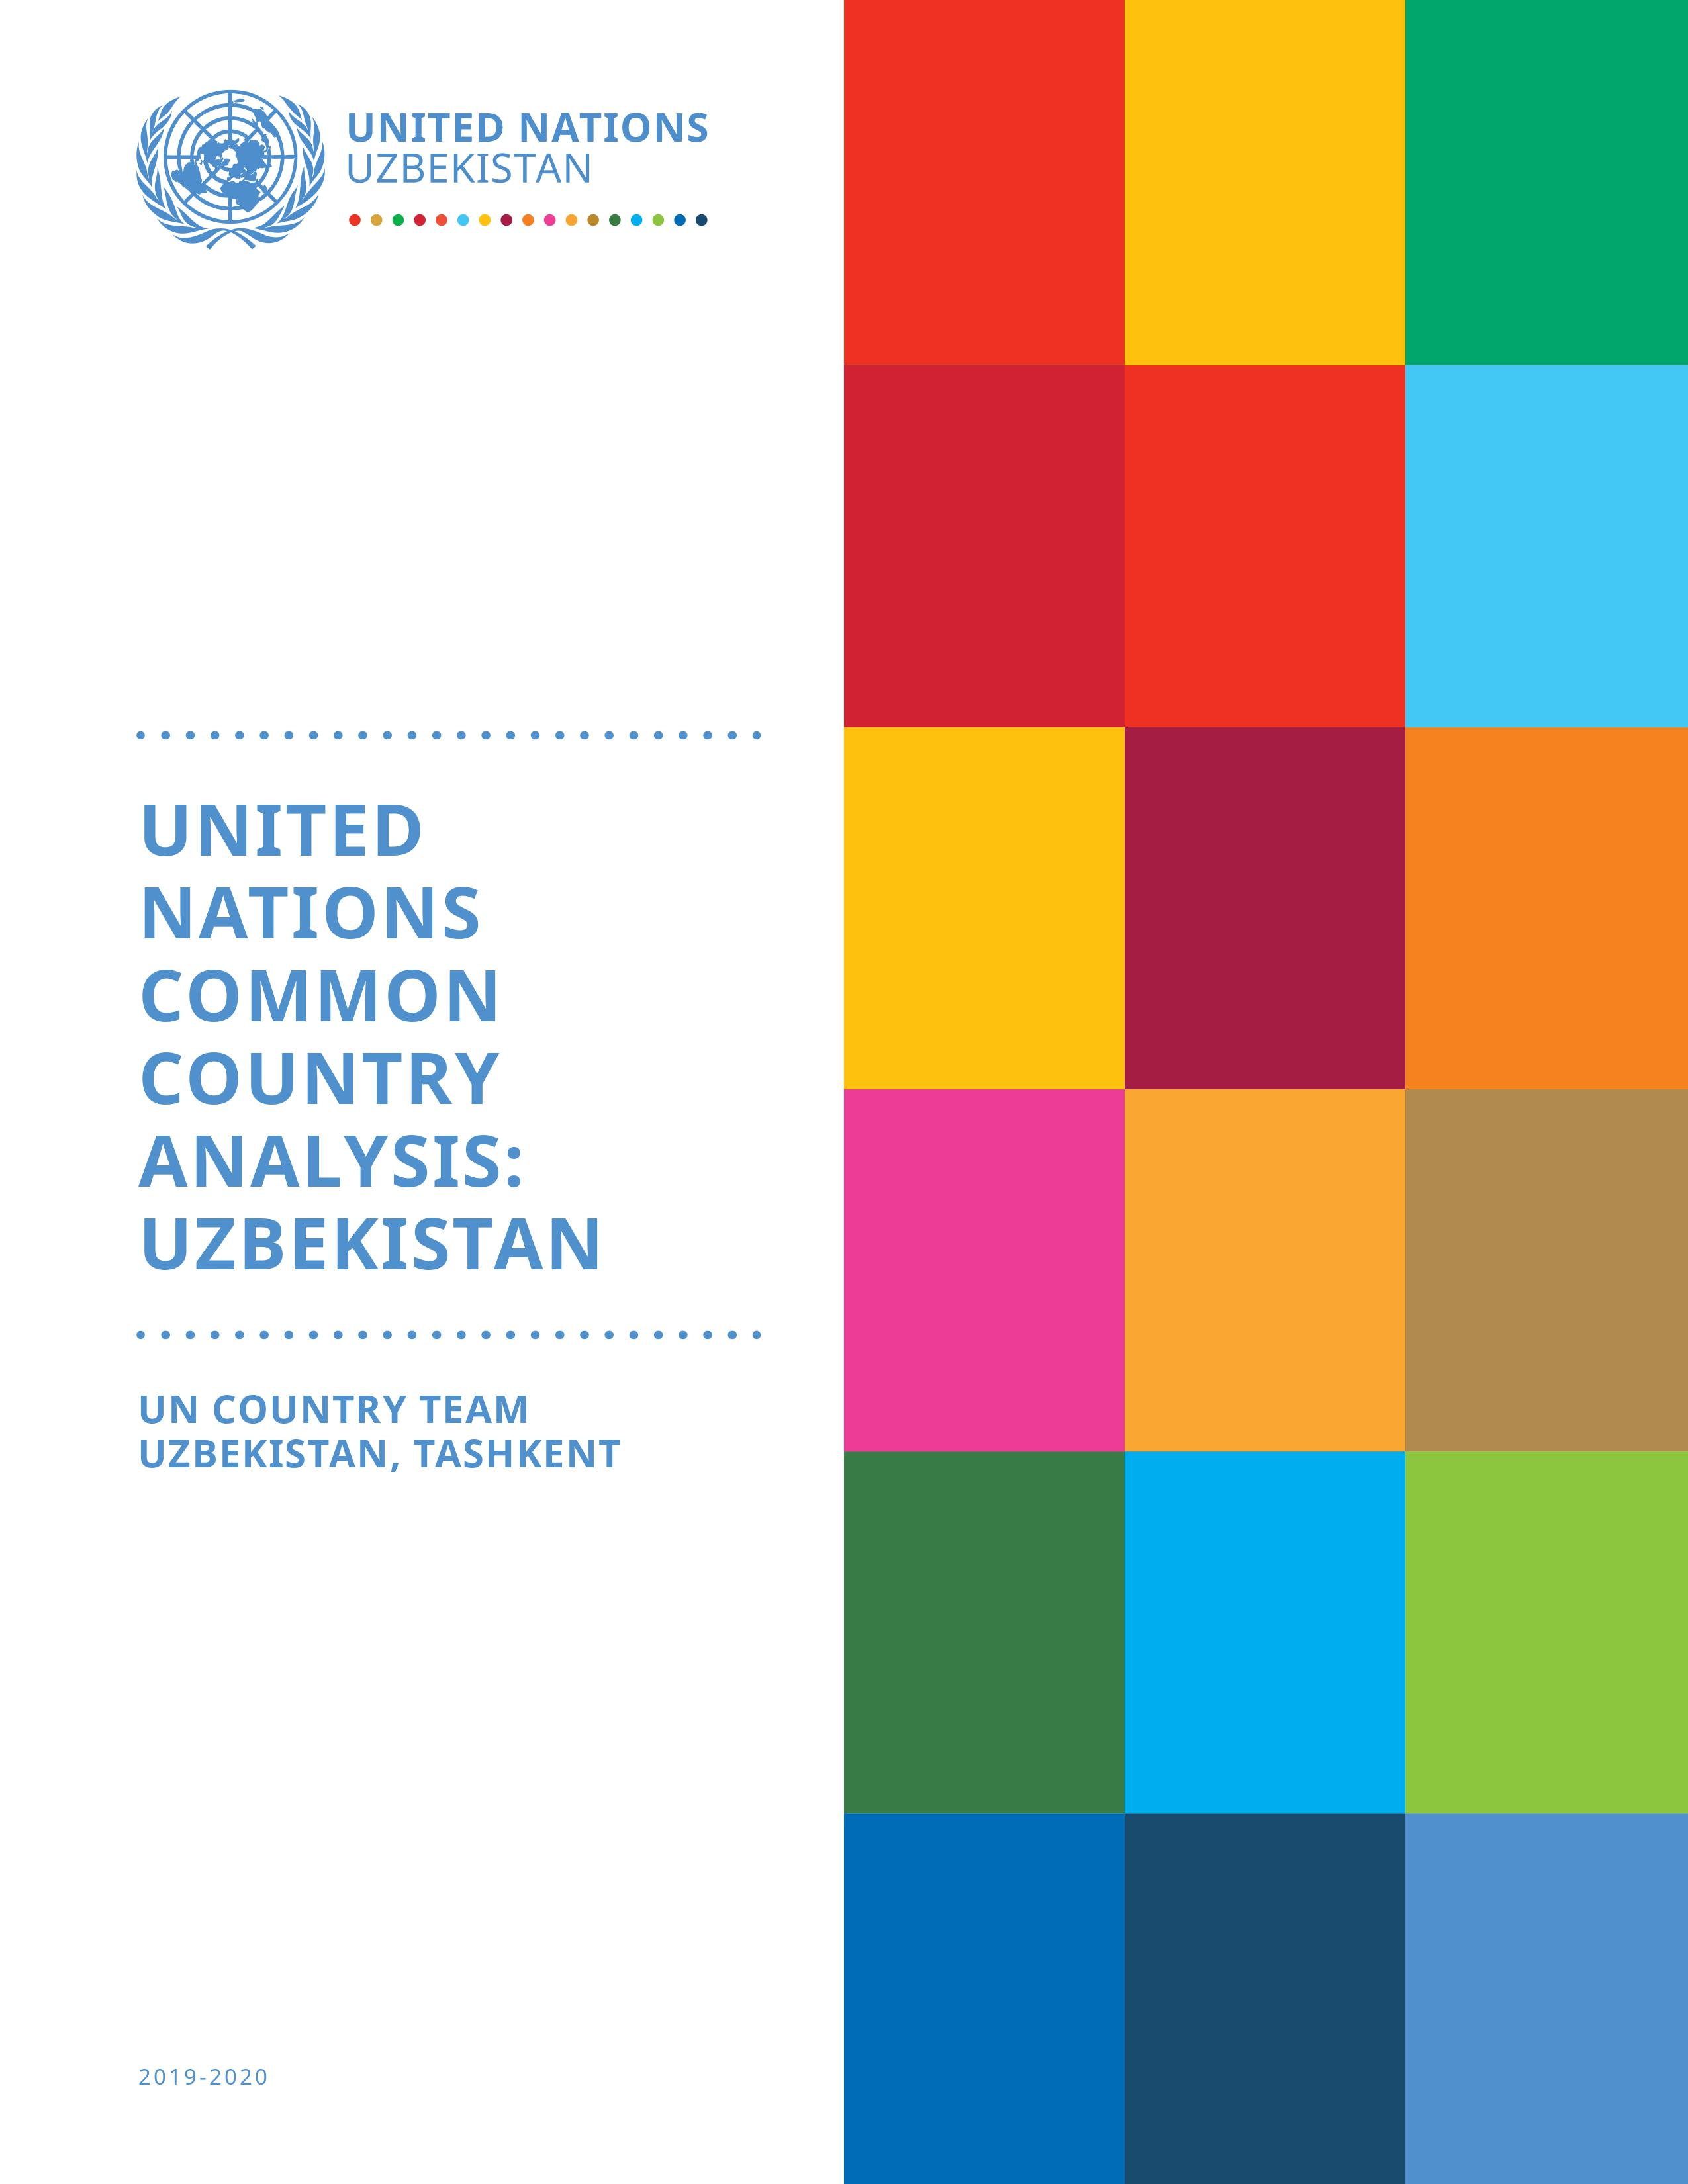 United Nations Common Country Analysis: Uzbekistan